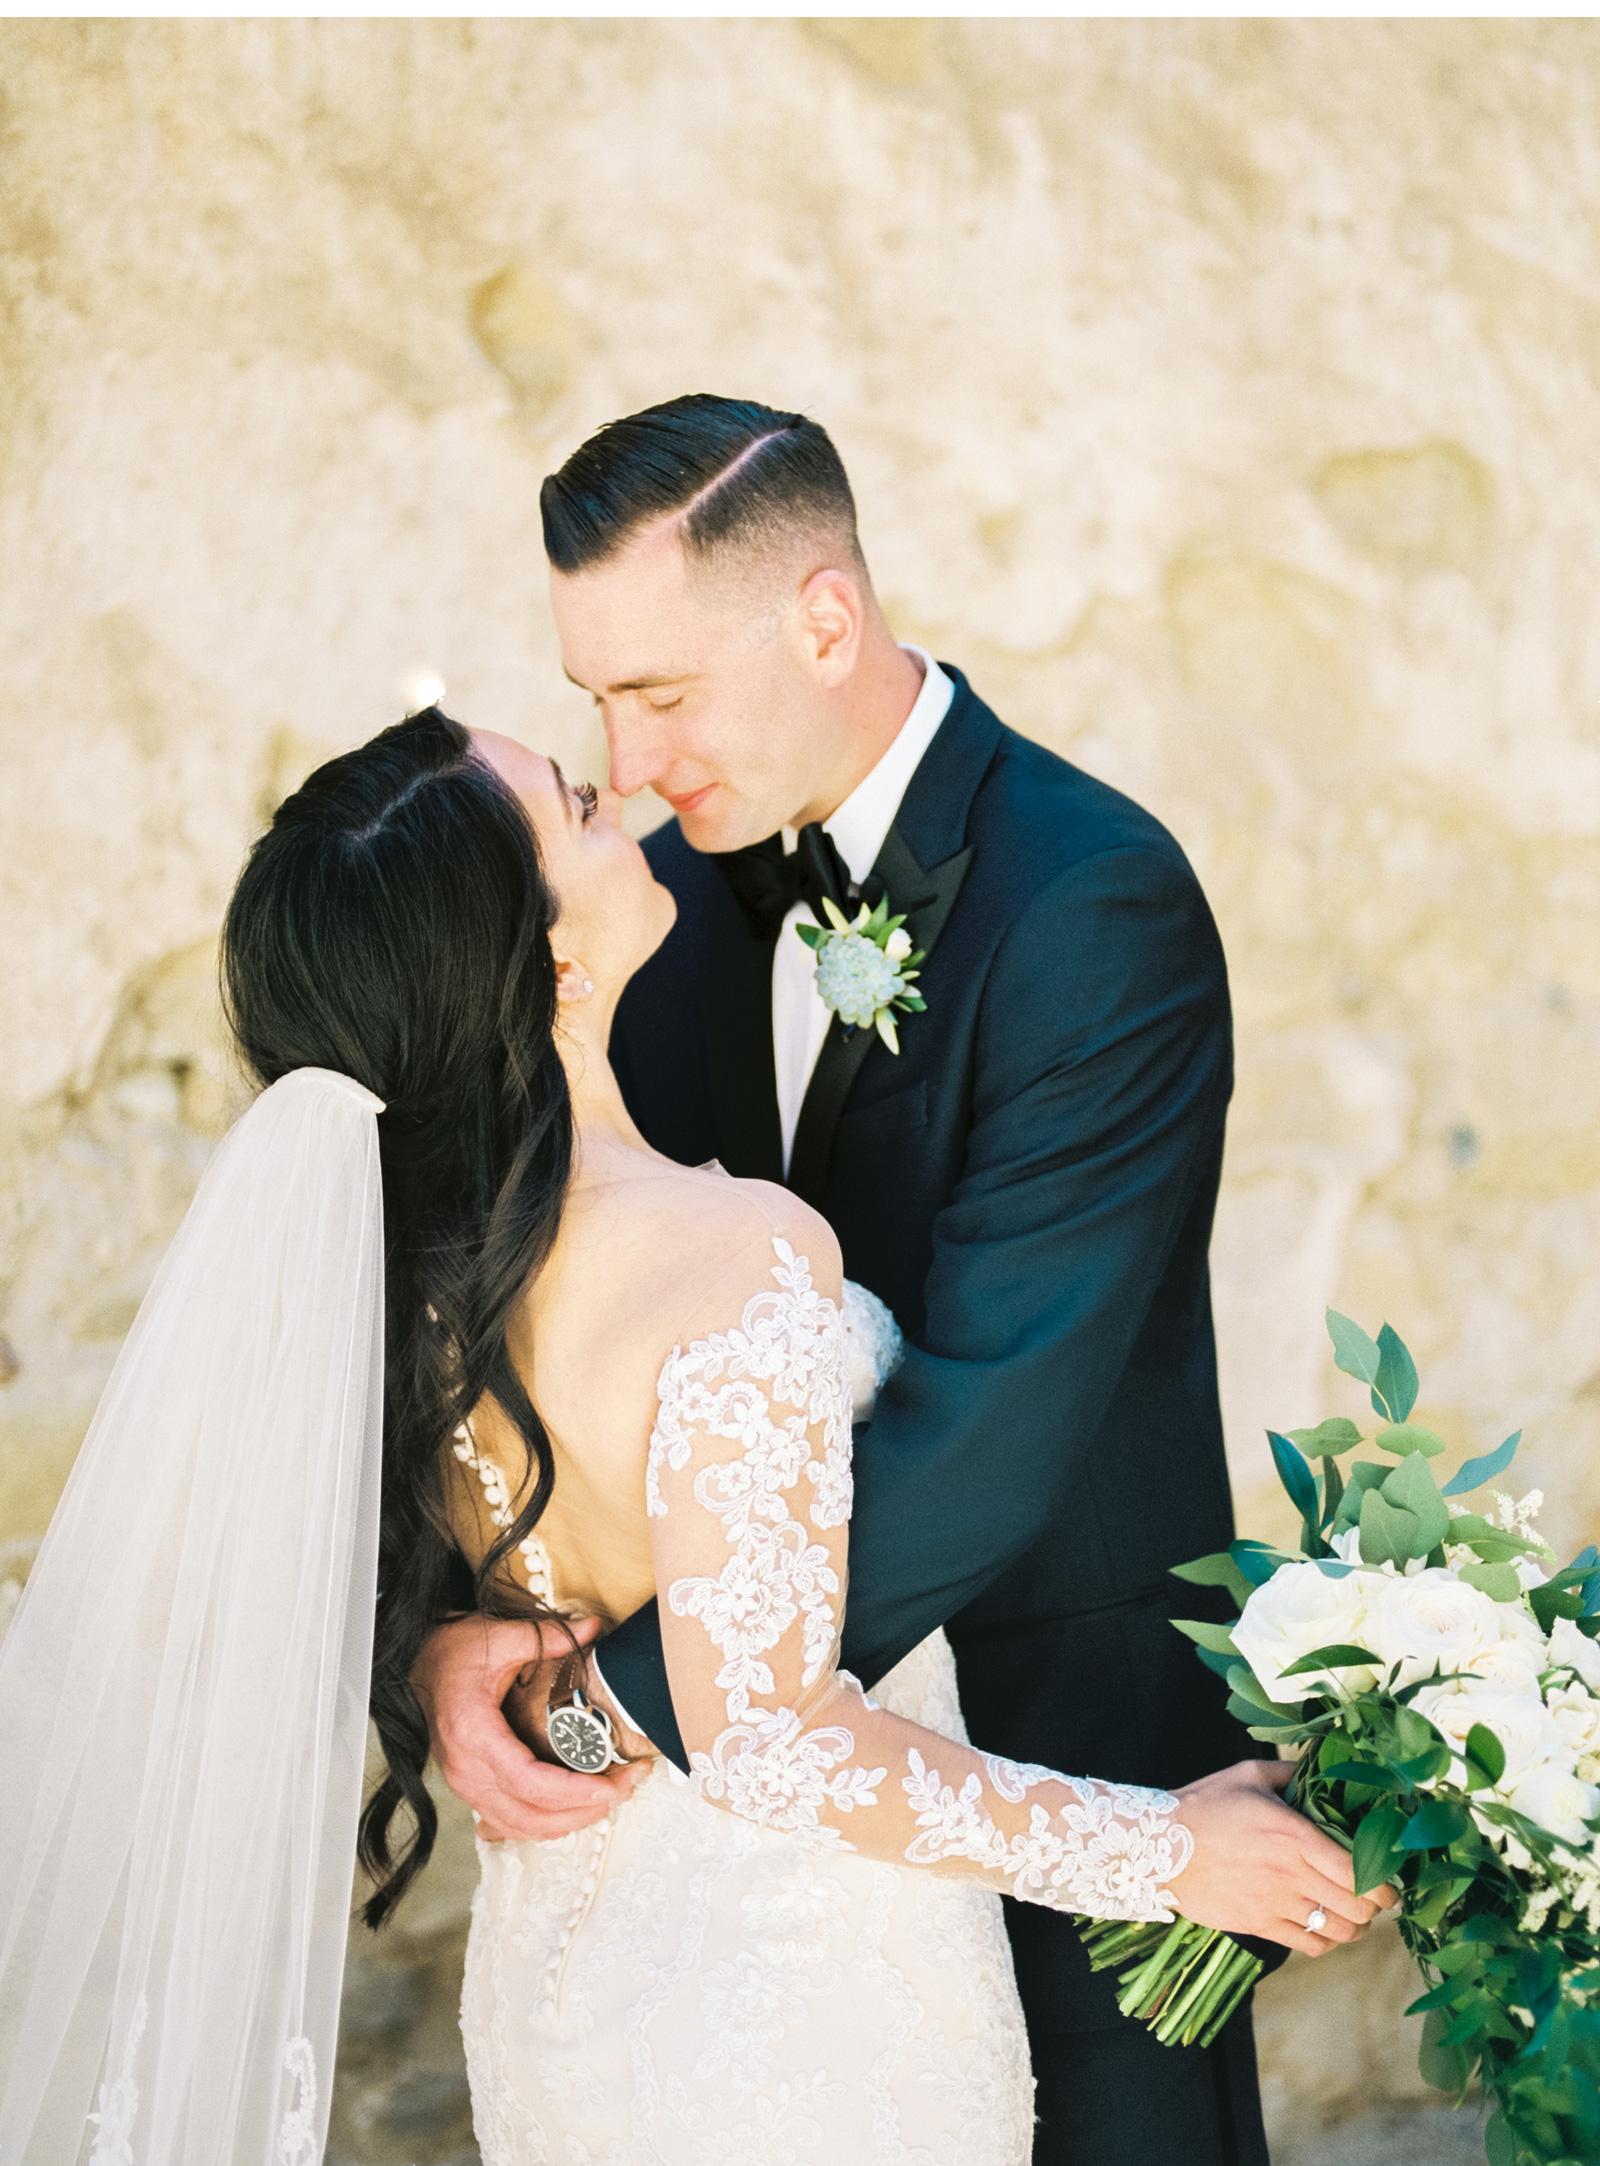 Southern-California-Weddings-Natalie-Schutt-Photography-Weddings_02.jpg